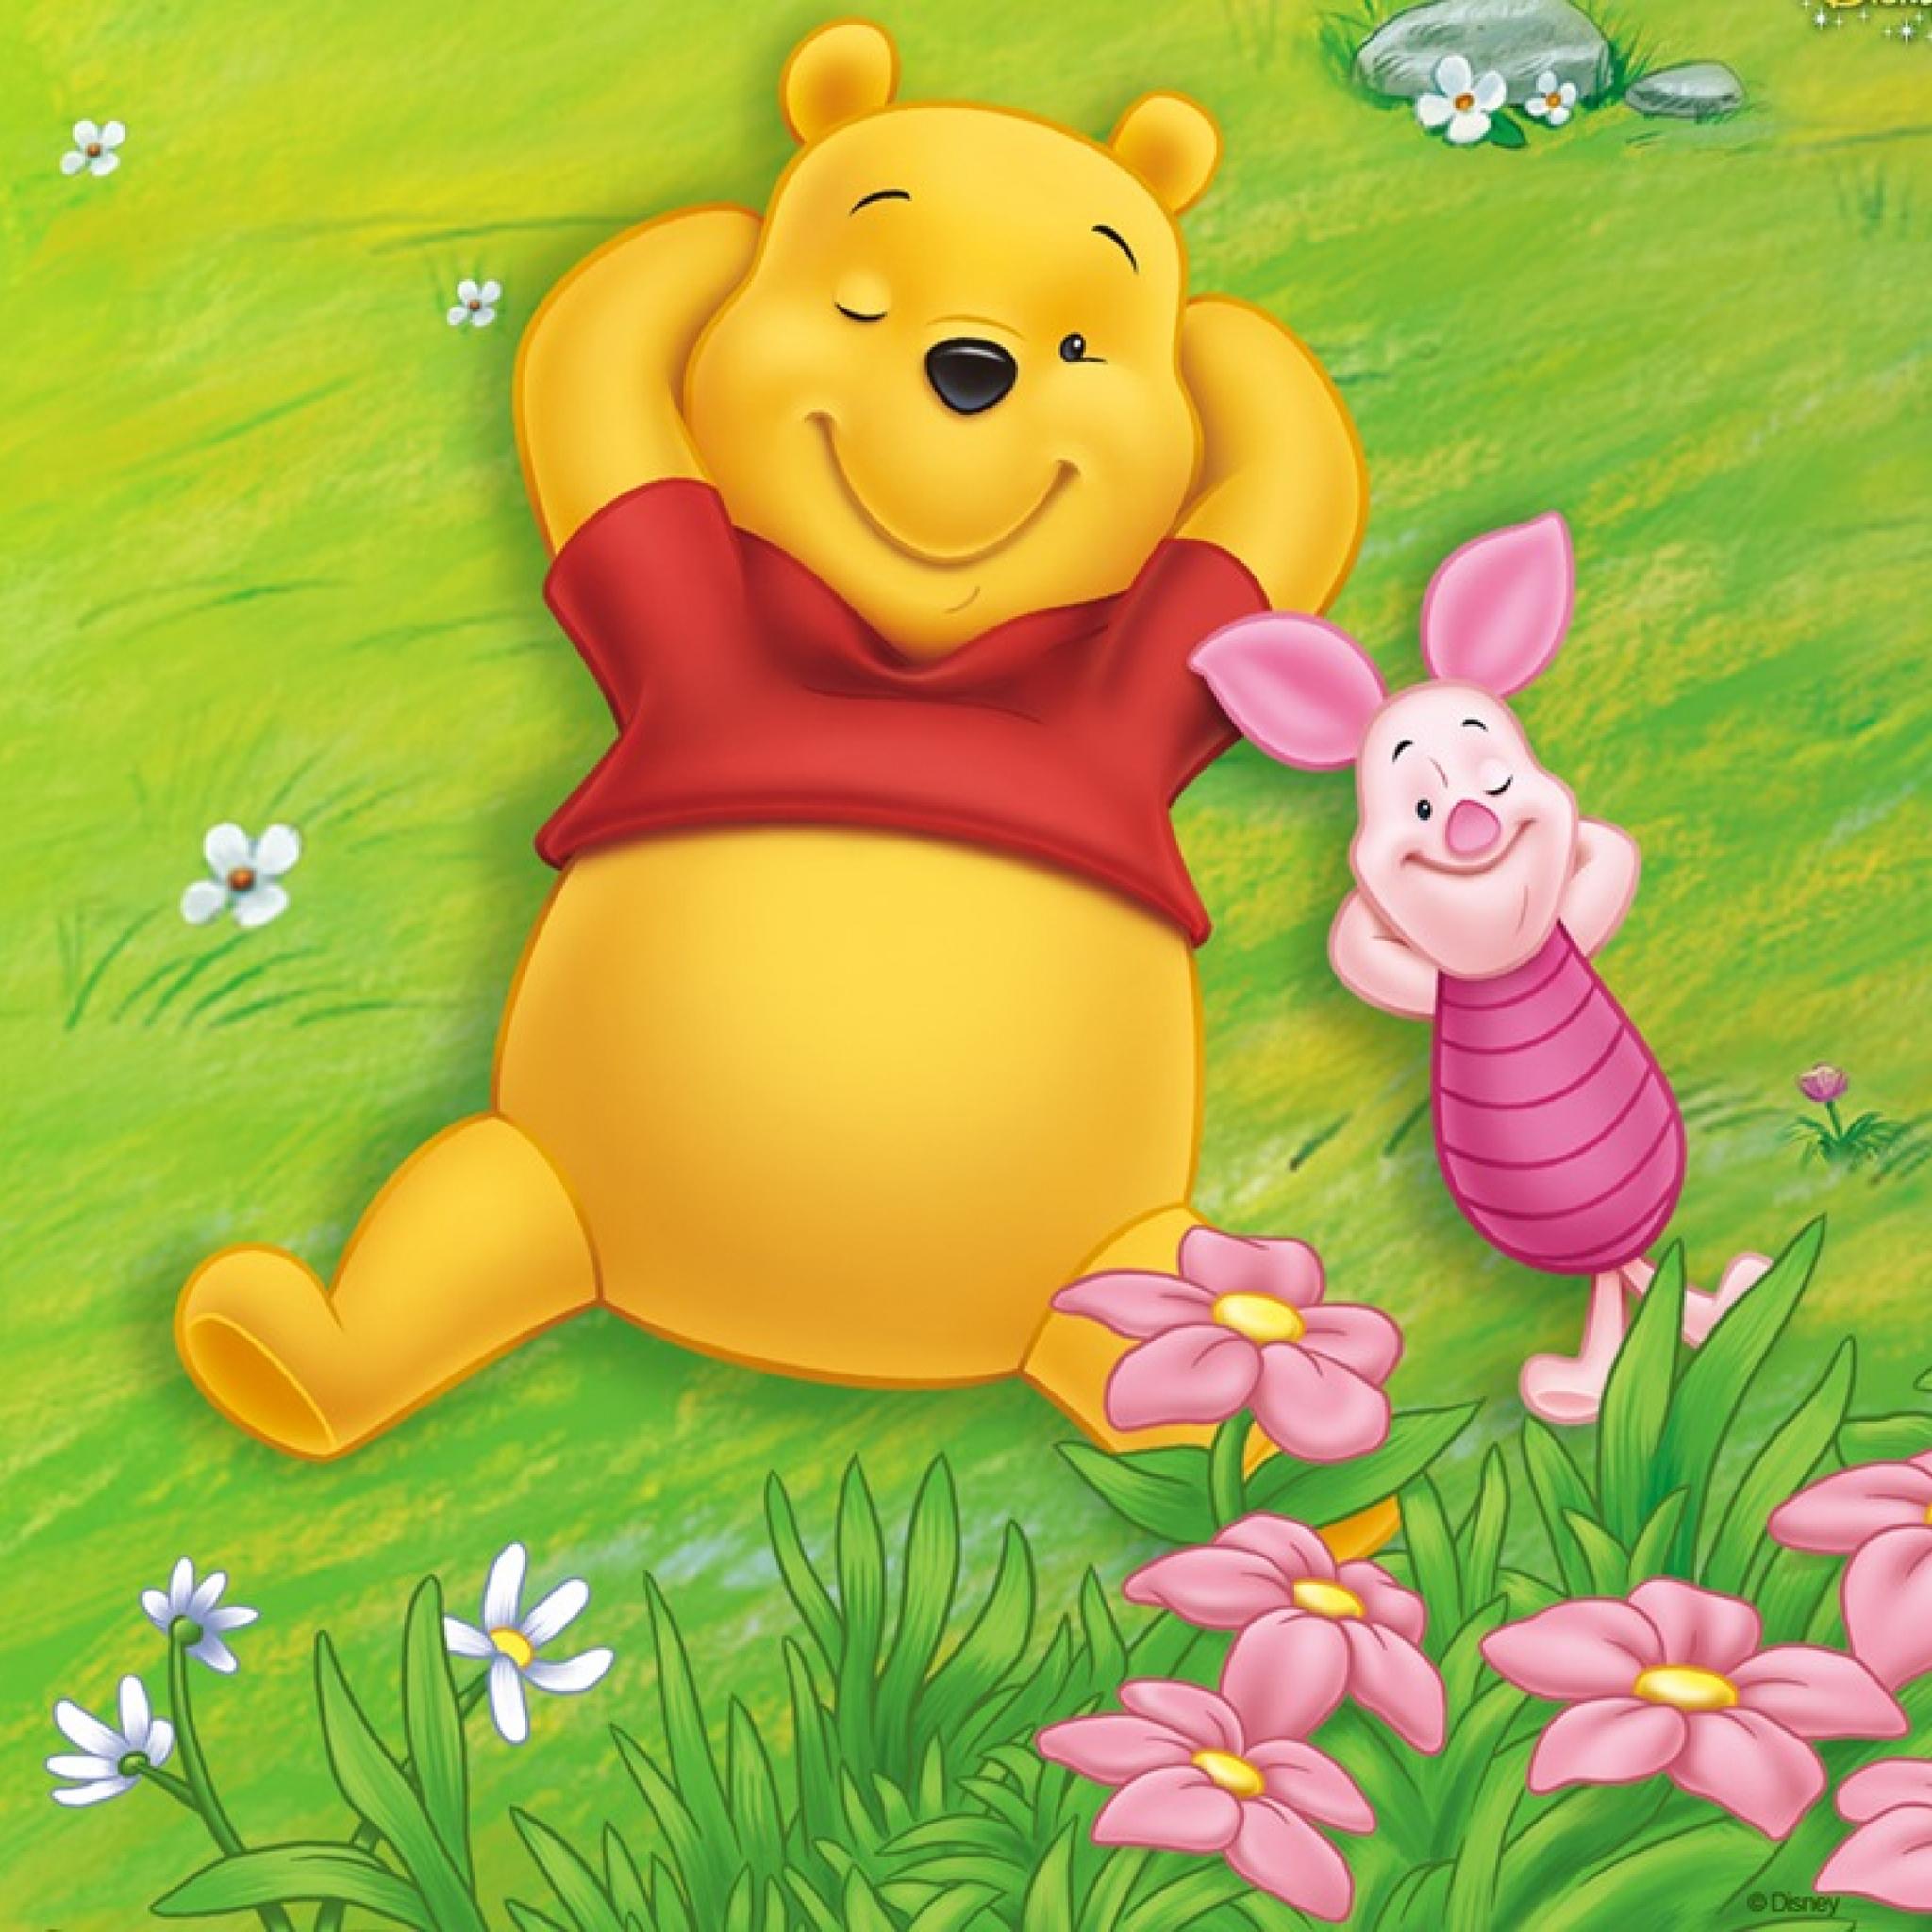 Winnie l 39 ourson ipad retina wallpaper for iphone x 8 7 - Rideau winnie l ourson castorama ...